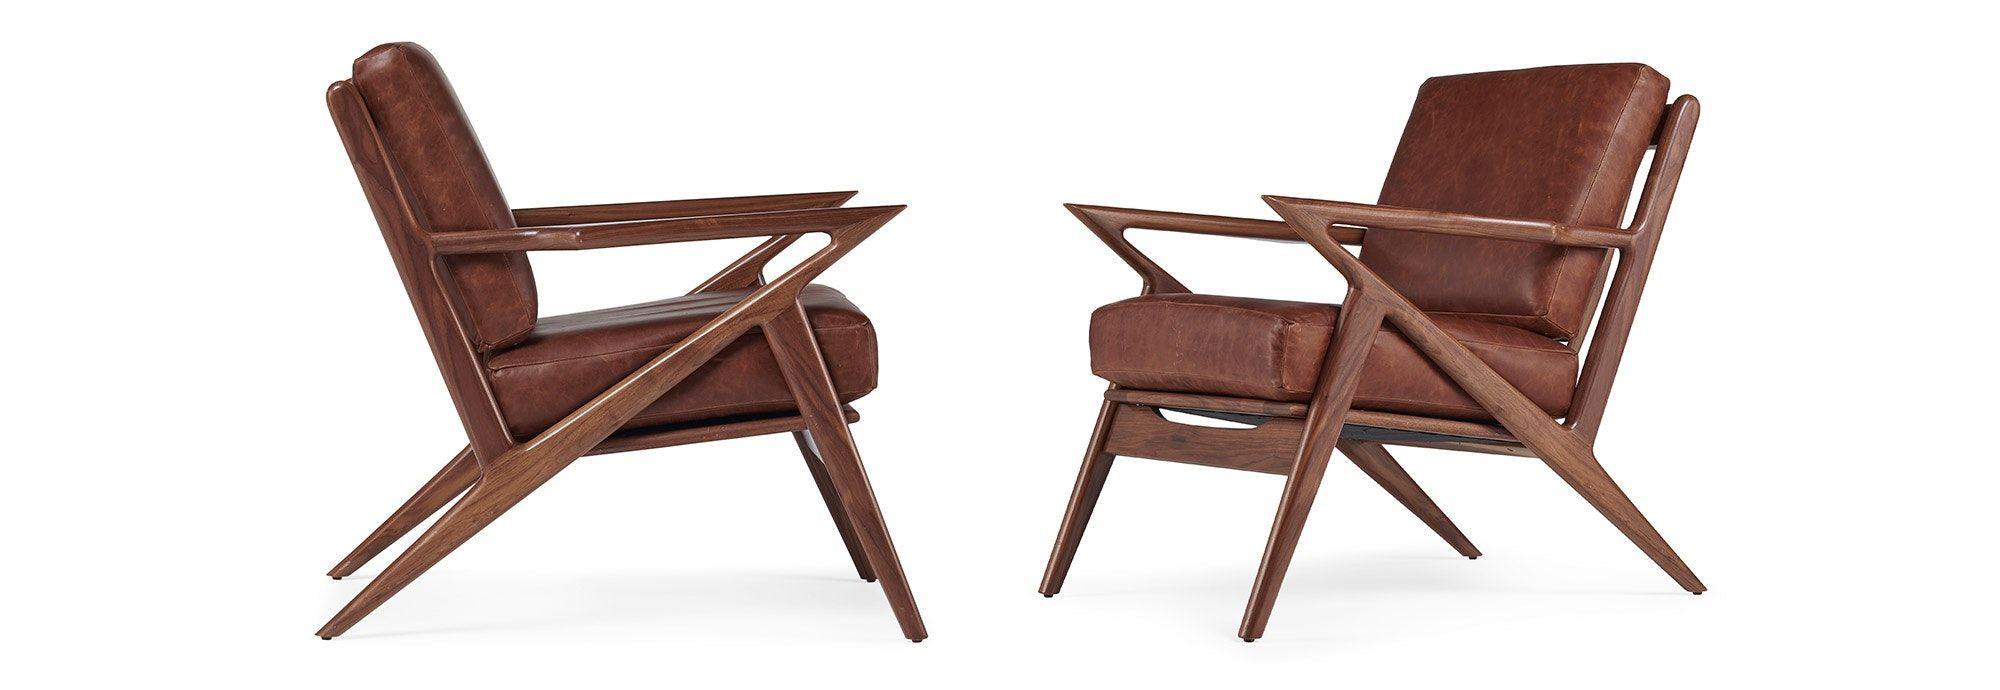 Brilliant Soto Leather Chair In 2019 Terrace Chair Chair Bed Inzonedesignstudio Interior Chair Design Inzonedesignstudiocom